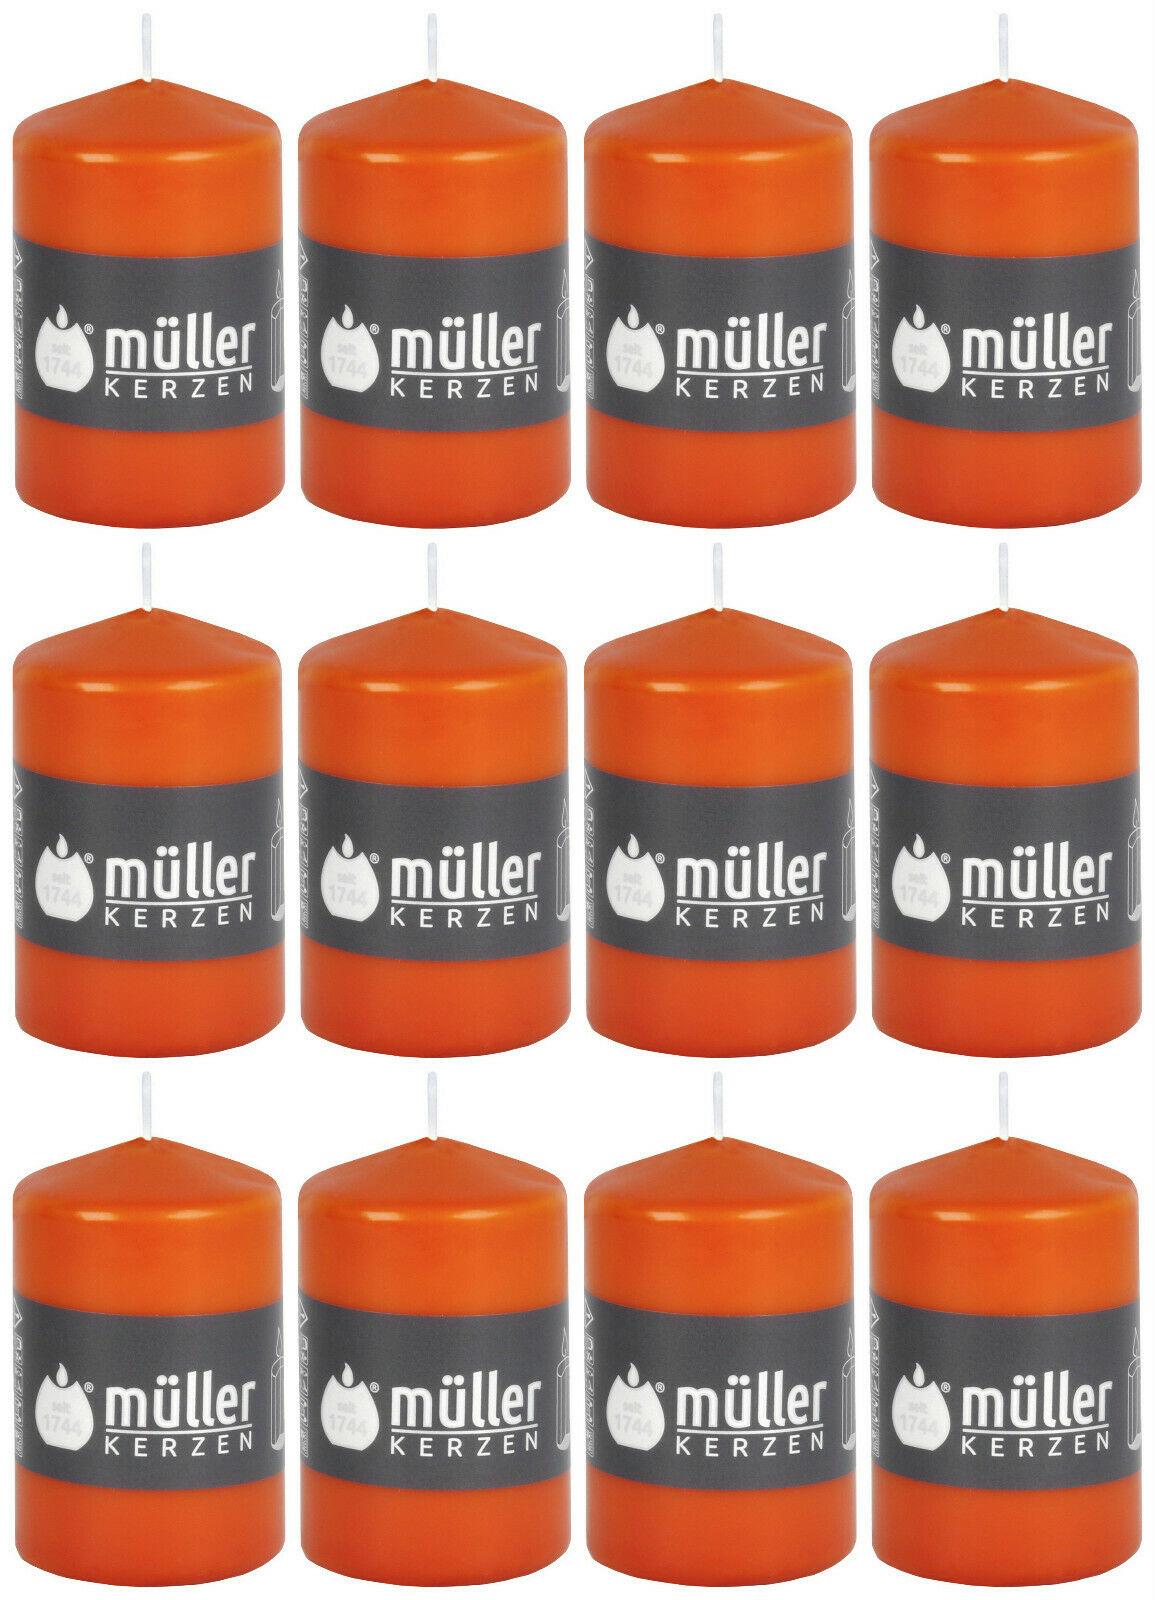 12 Stück Müller Stumpenkerzen 90x55 mm Stumpen Kerze mit BBS Durchbrandsperre - Orange / Mandarin